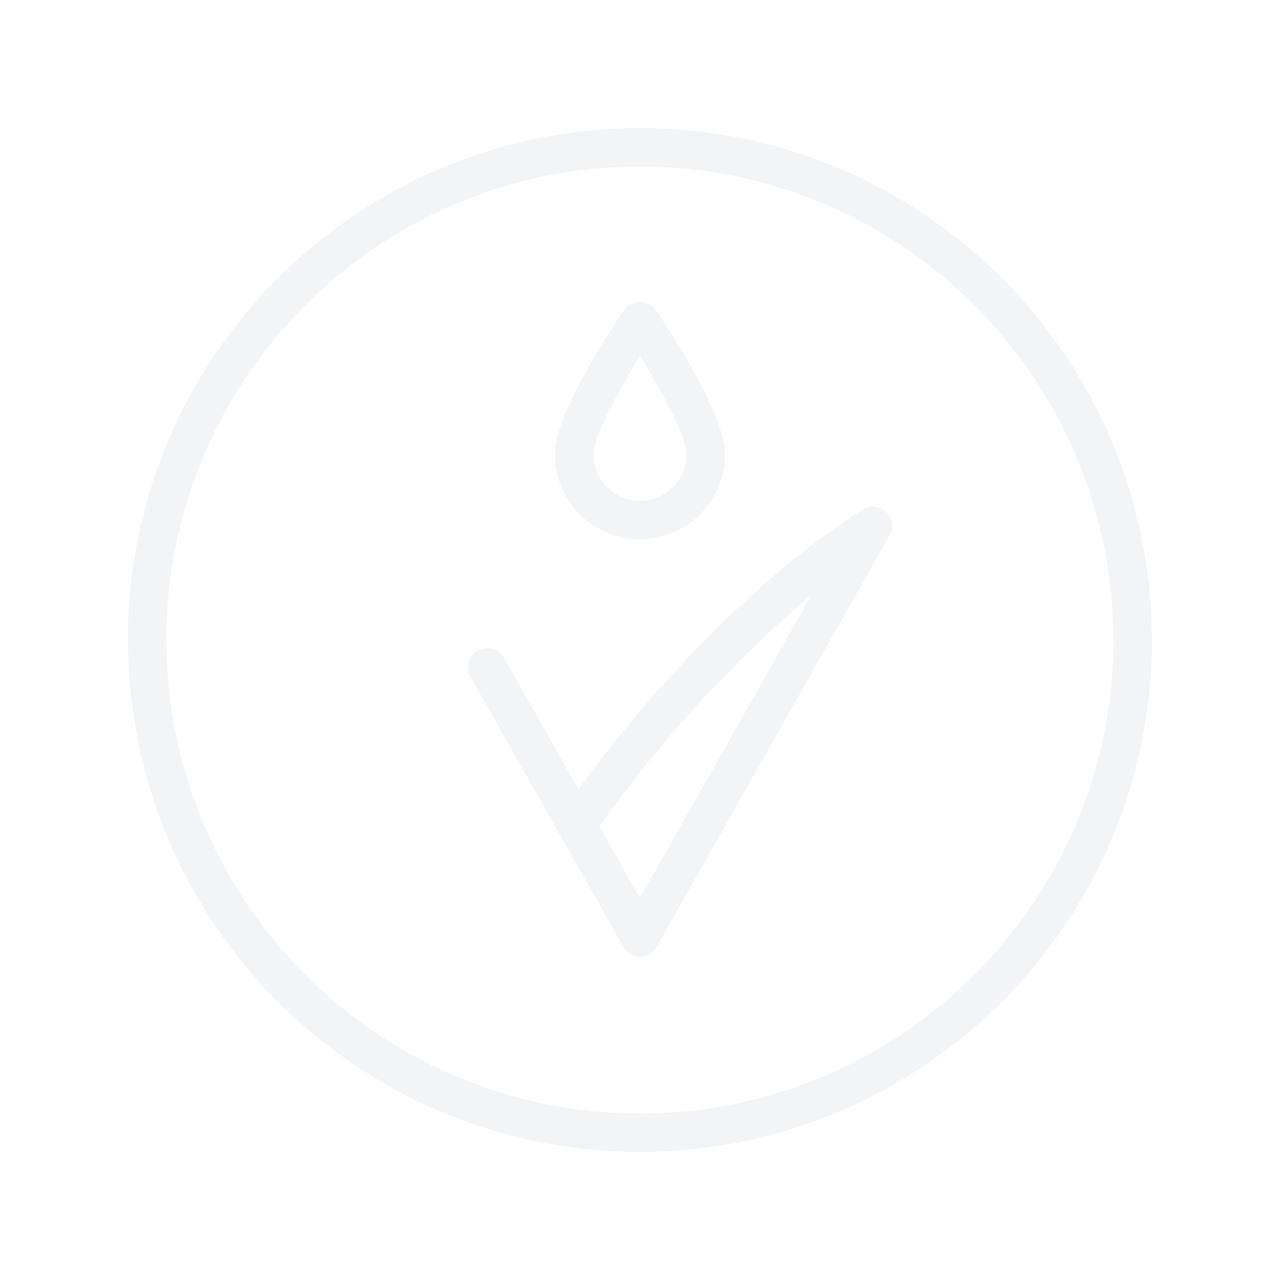 Payot Deodorant Ultra Douceur Roll-On Deodorant 75ml